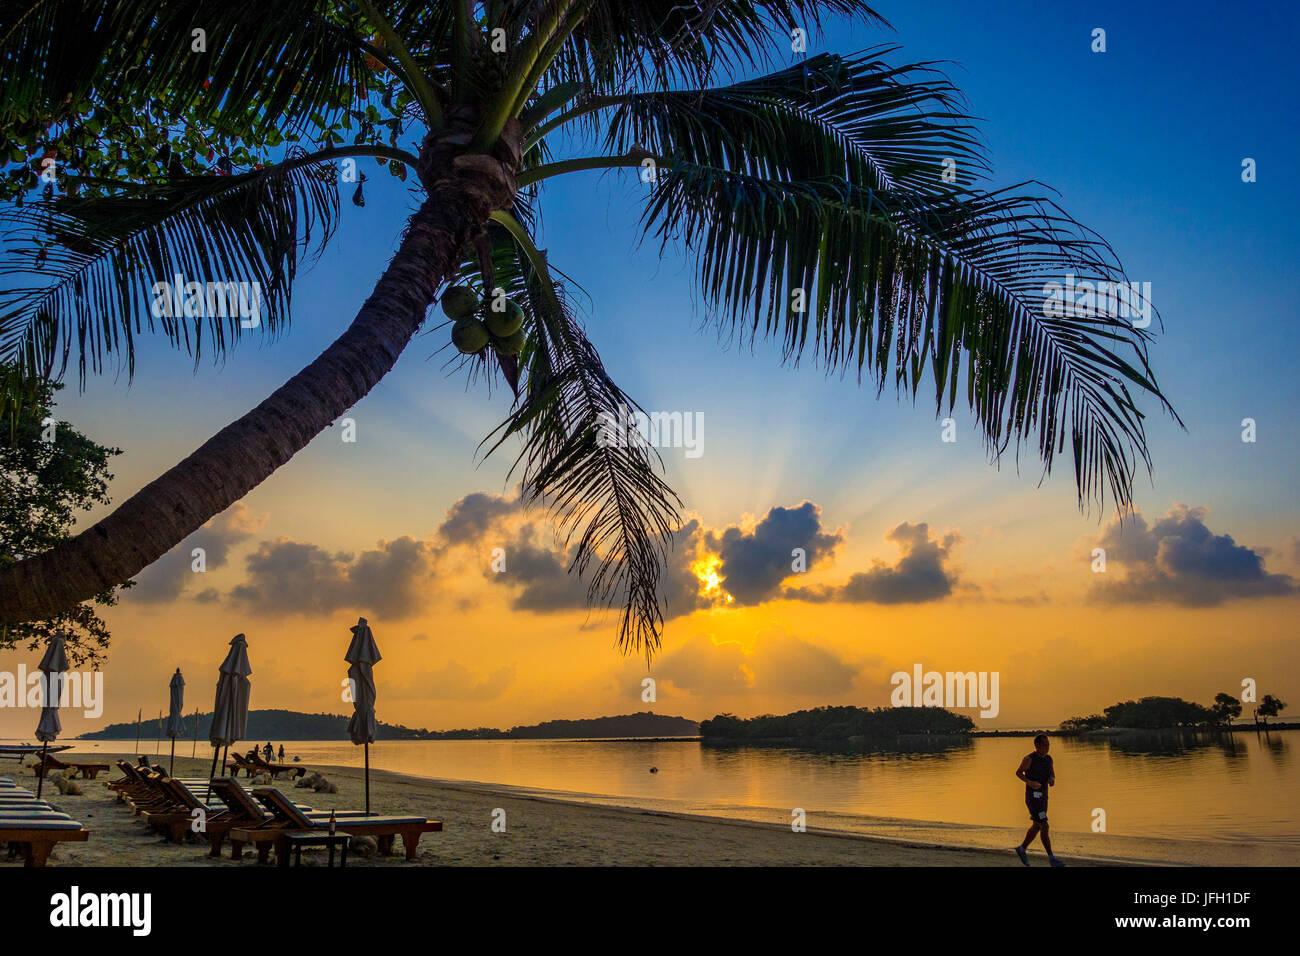 Deck chairs on the beach wait for tourist, Chaweng Beach, island Ko Samui, Thailand, Asia - Stock Image